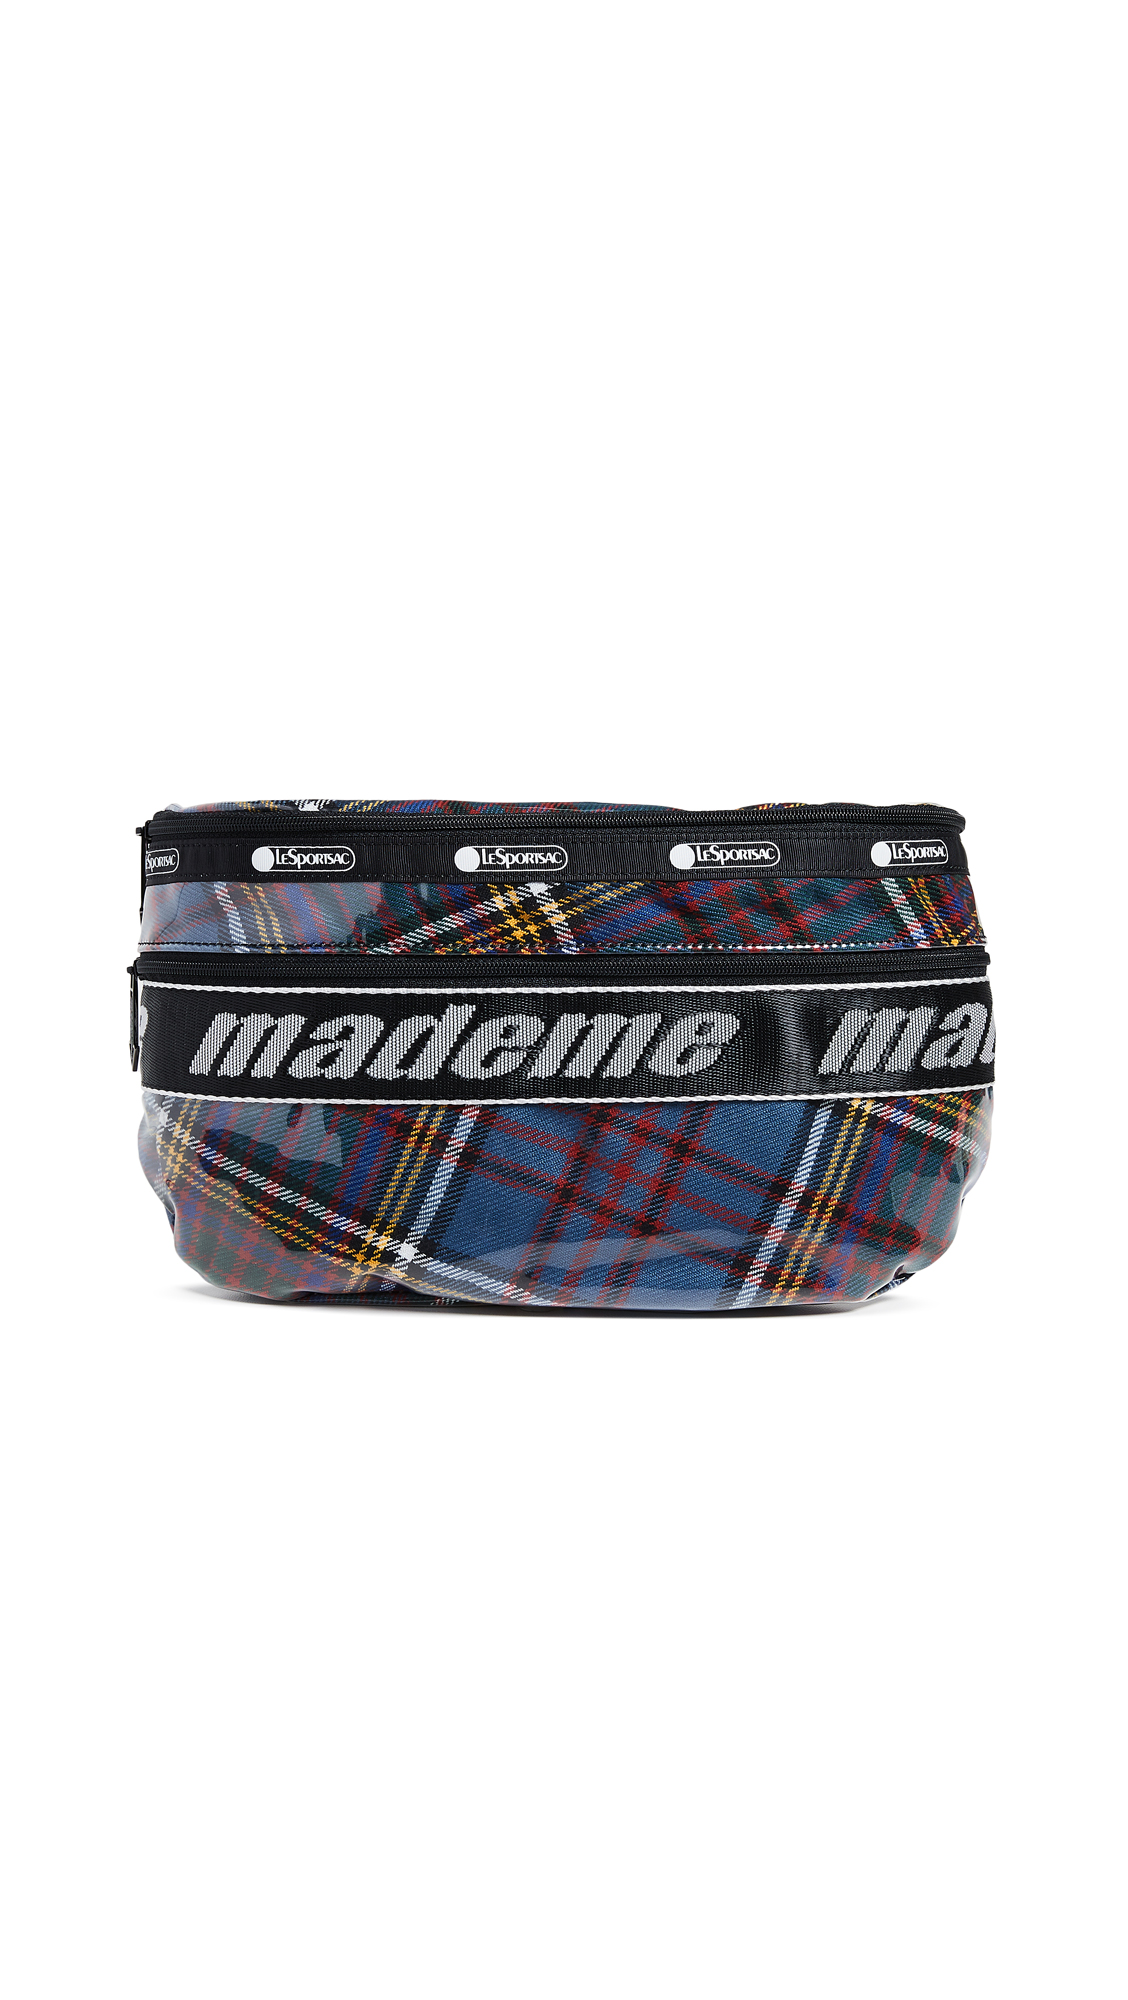 LESPORTSAC X Mademe Belt Bag in Blue Plaid